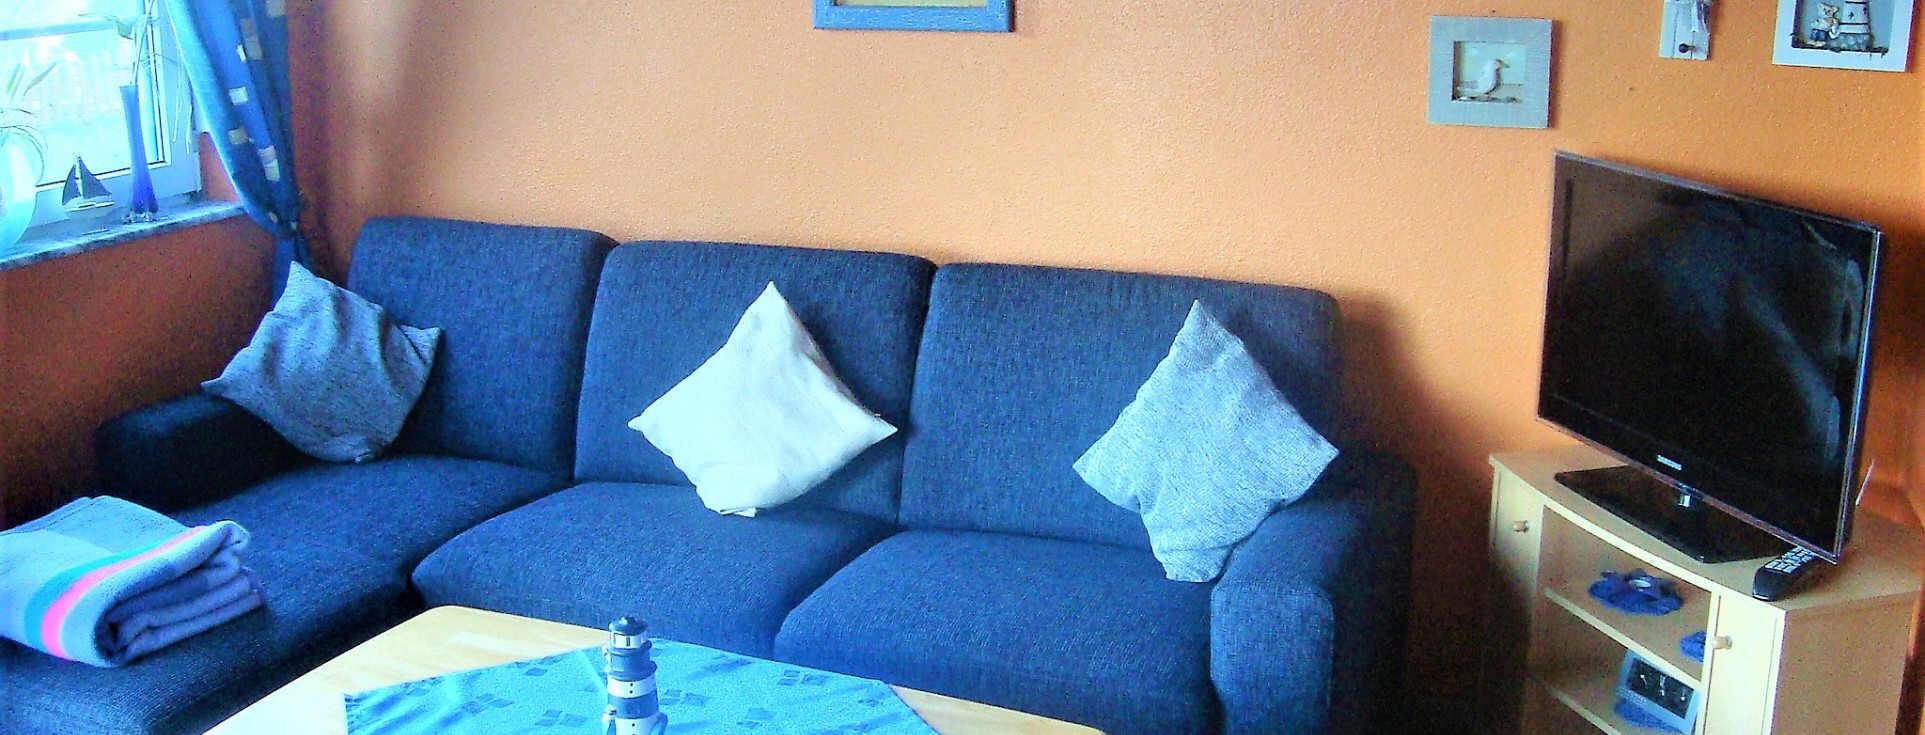 Ferienhaus Strolchi neues Sofa